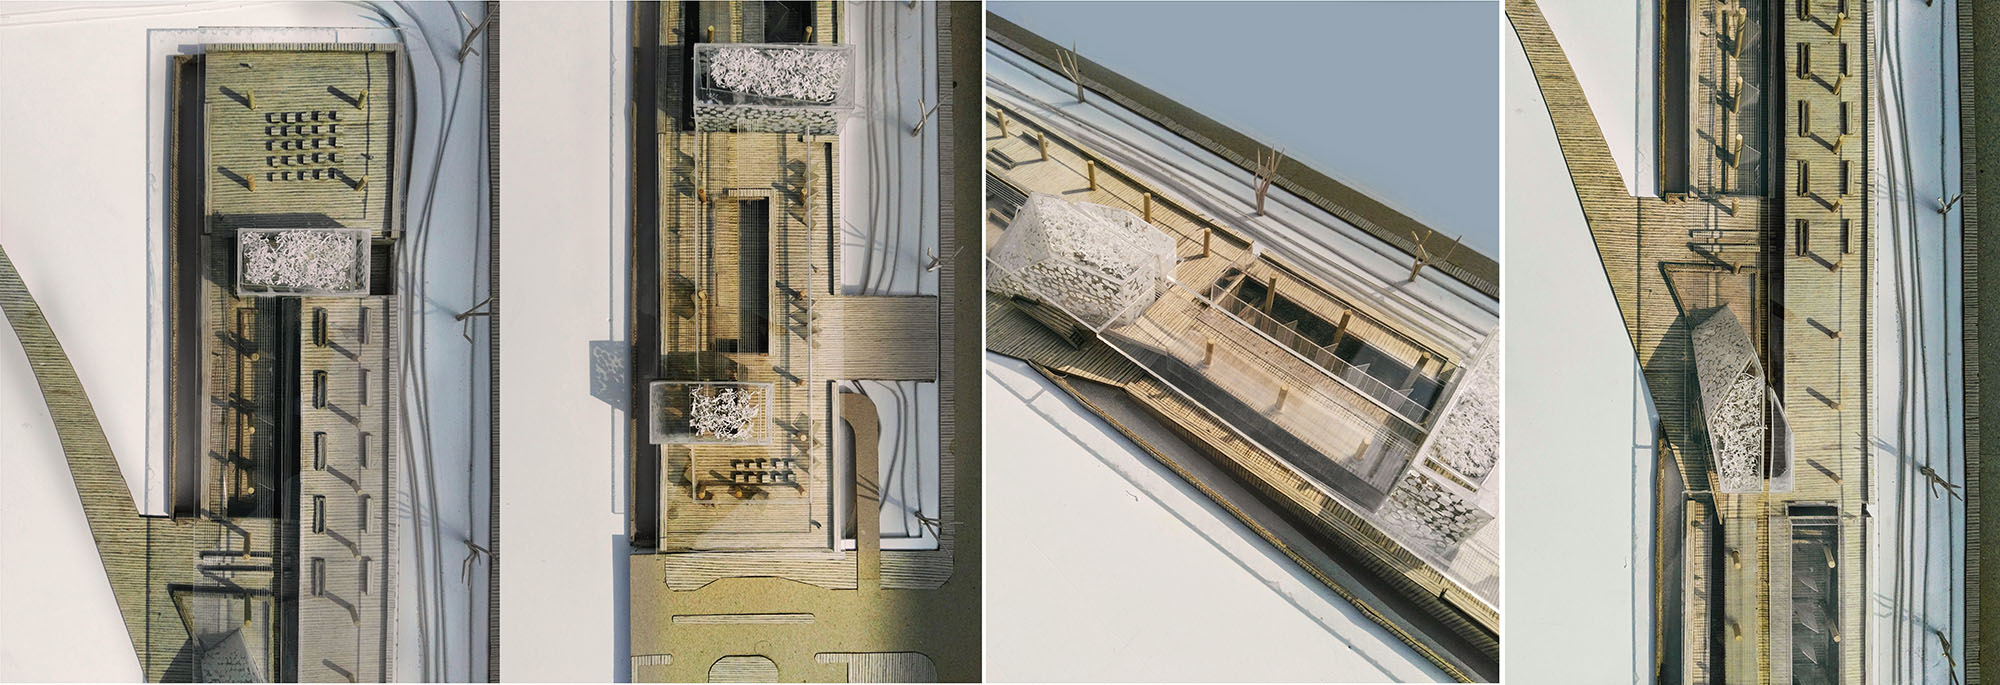 Model Photographs of Documentation Center & Research Institute © Nishat Tasnim Oyshee   UAP